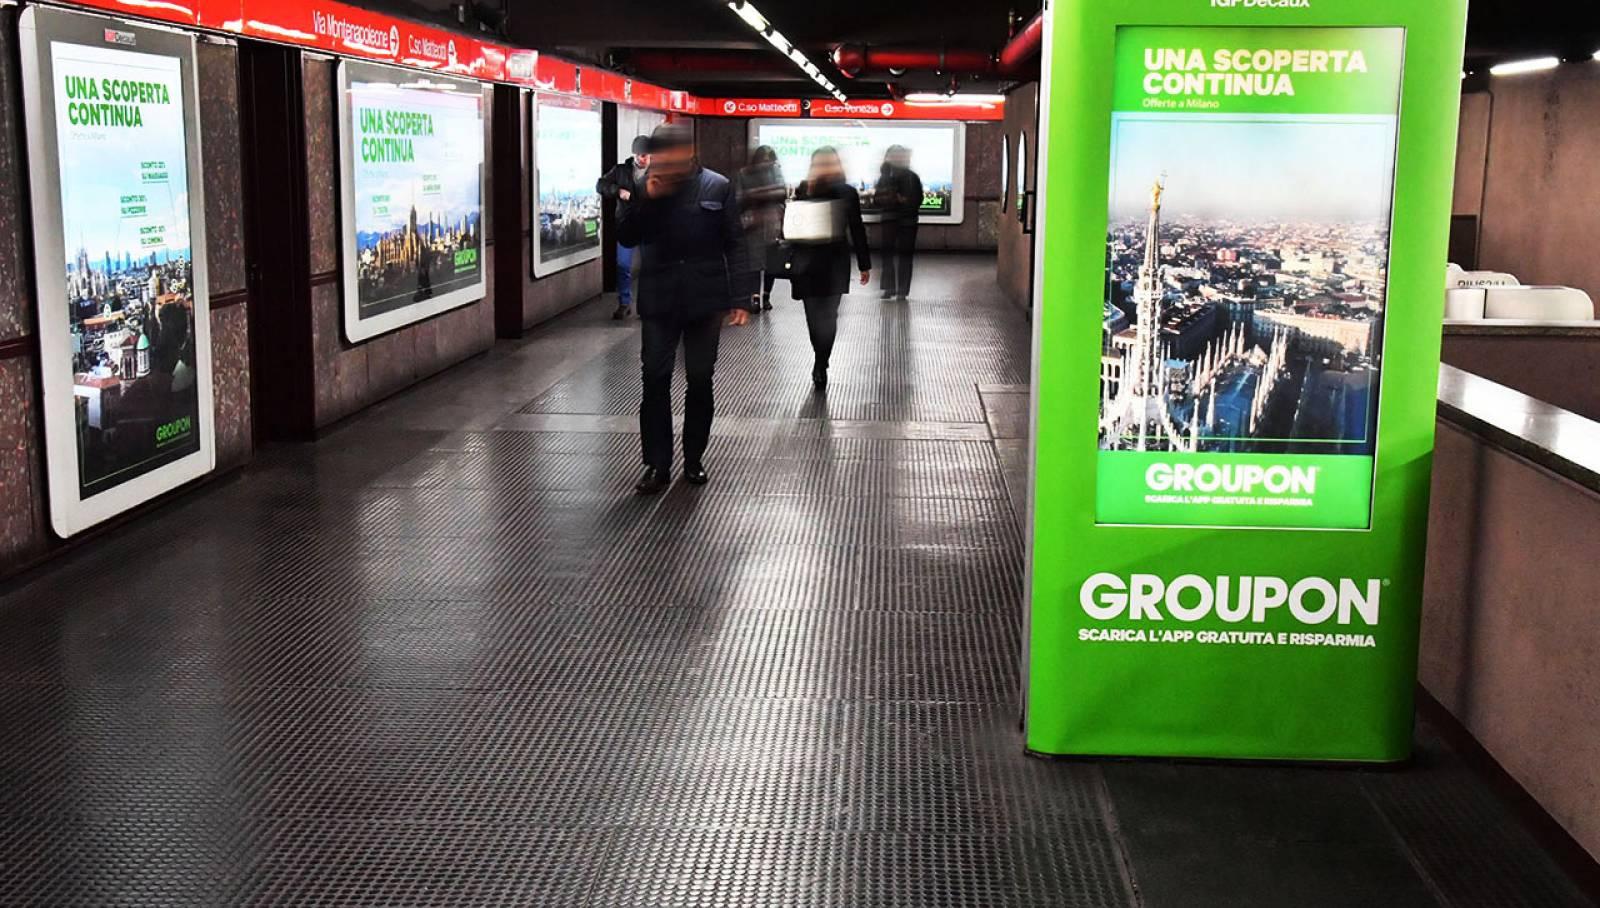 Pubblicità in metropolitana IGPDecaux station domination per Groupon a Milano